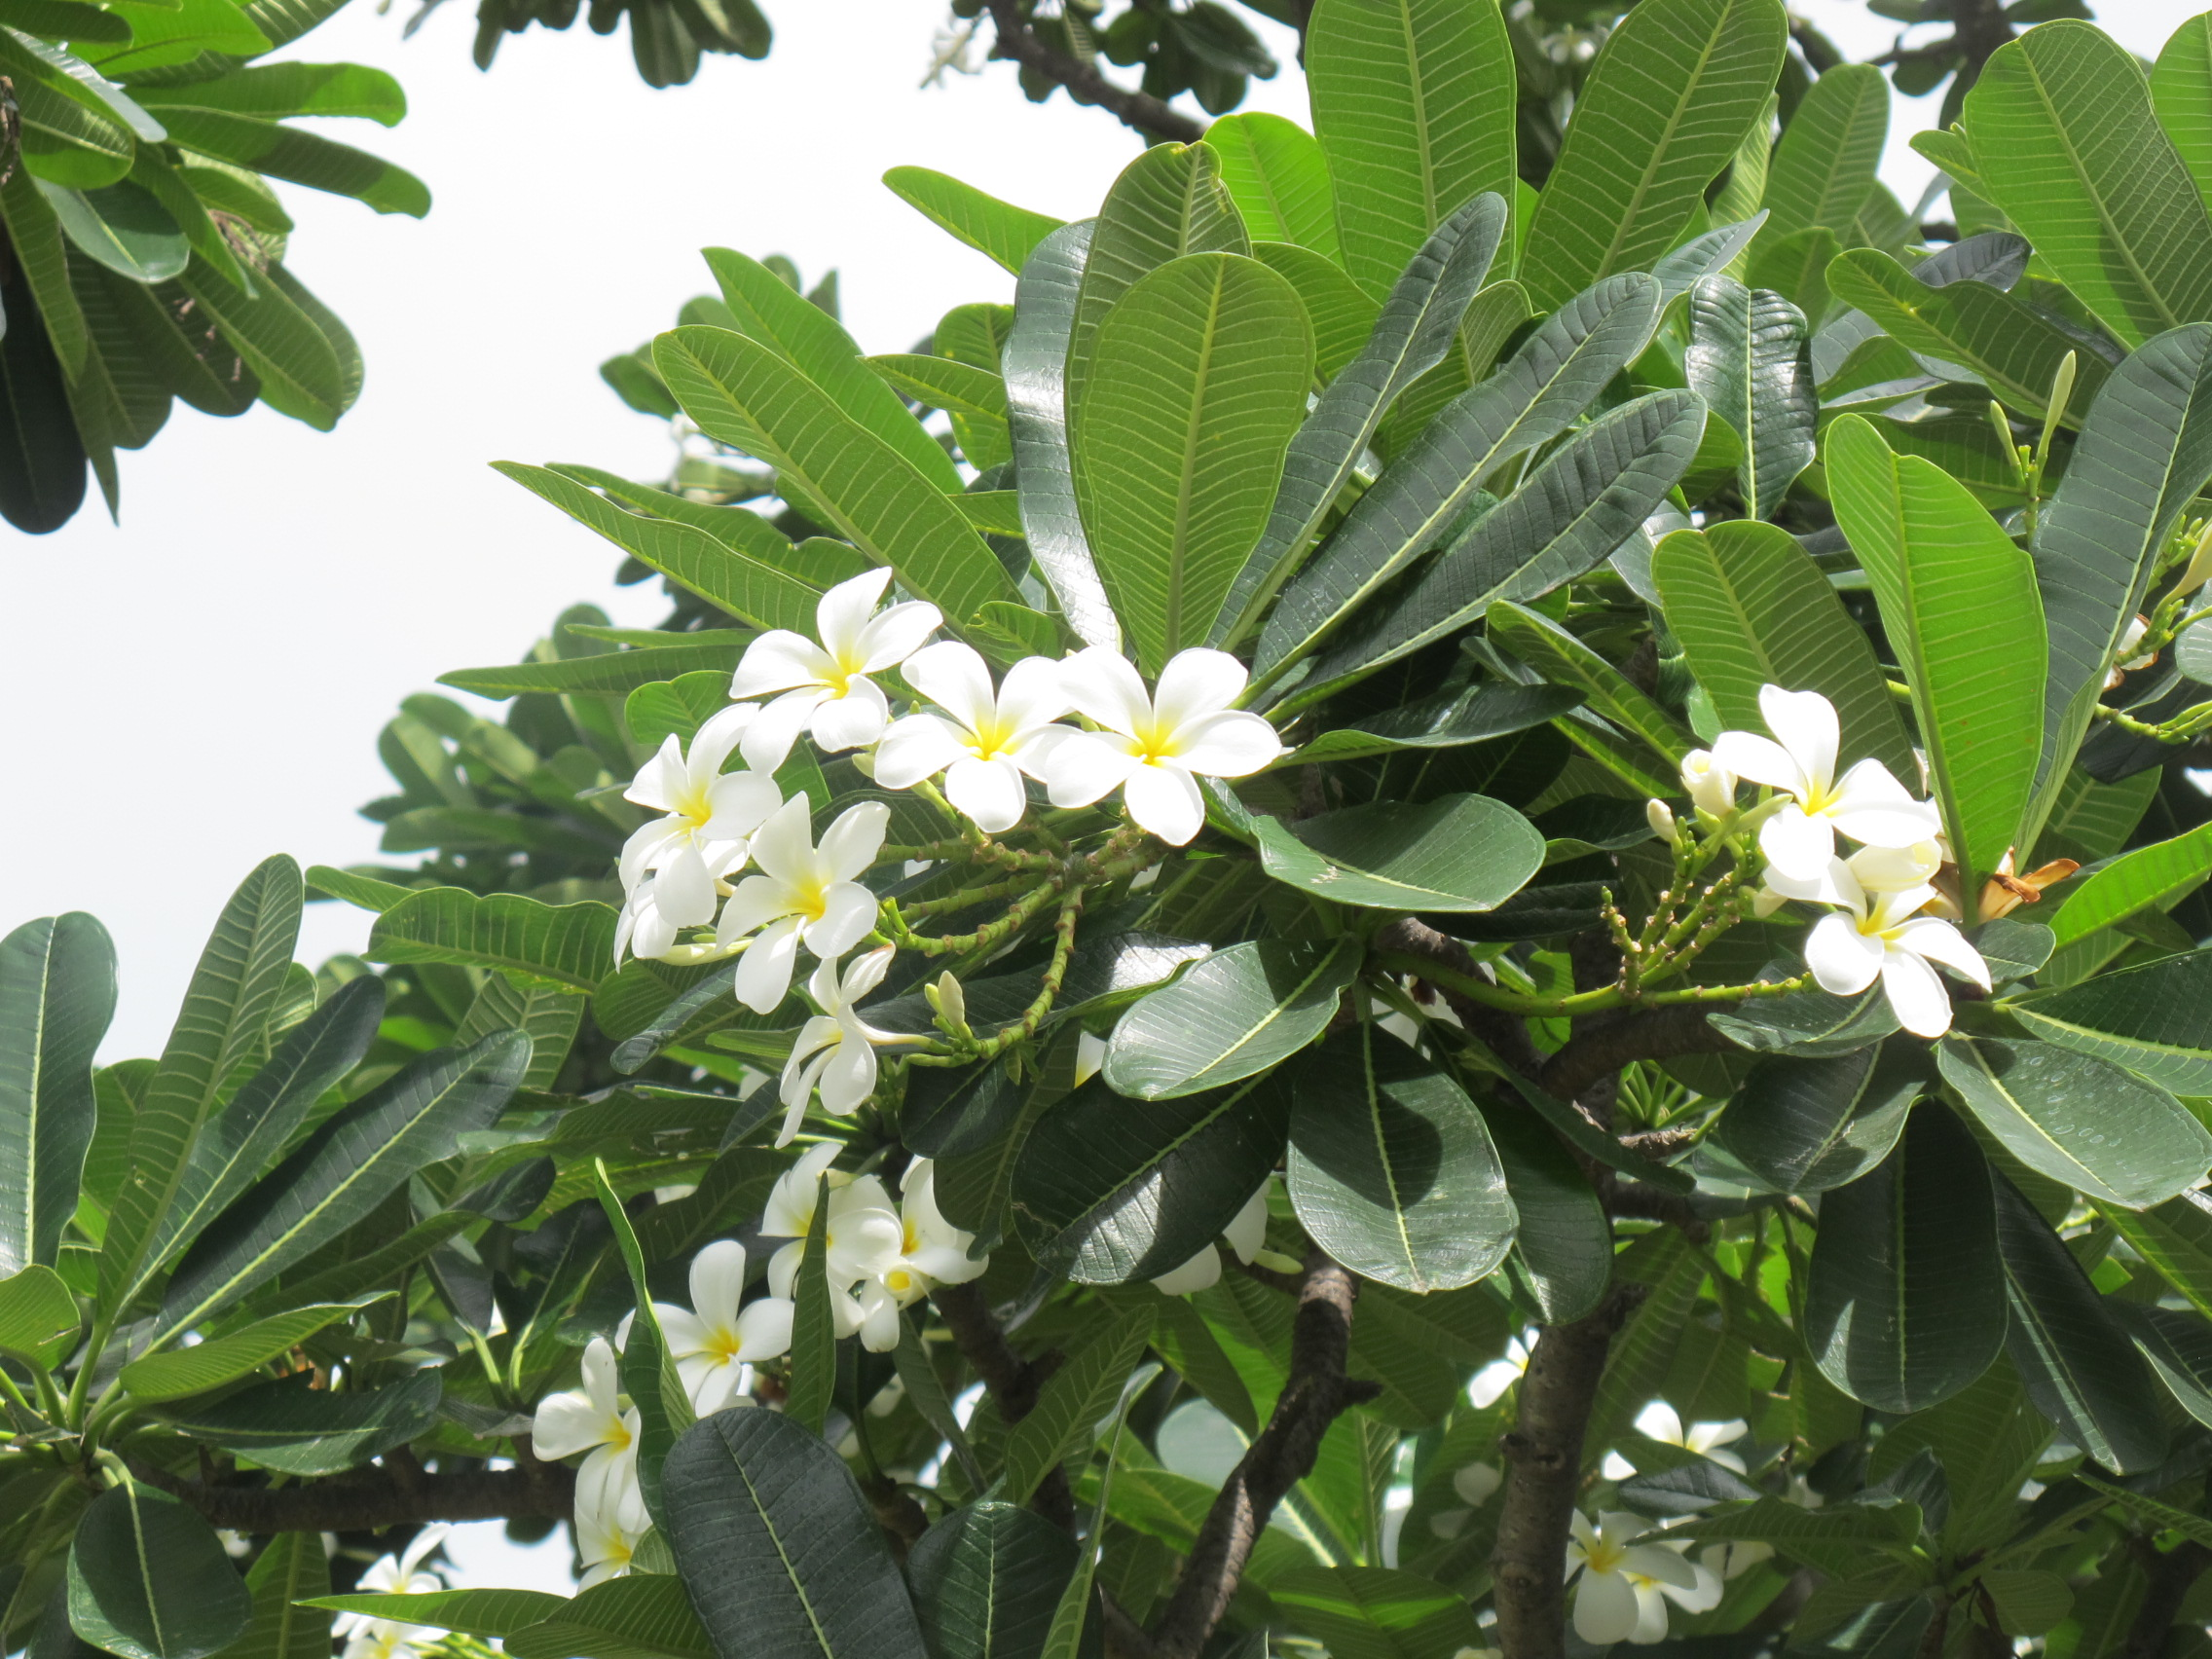 Beautiful hawaiian tree with white flowers contemporary wedding great hawaiian tree with white flowers gallery wedding and flowers izmirmasajfo Images